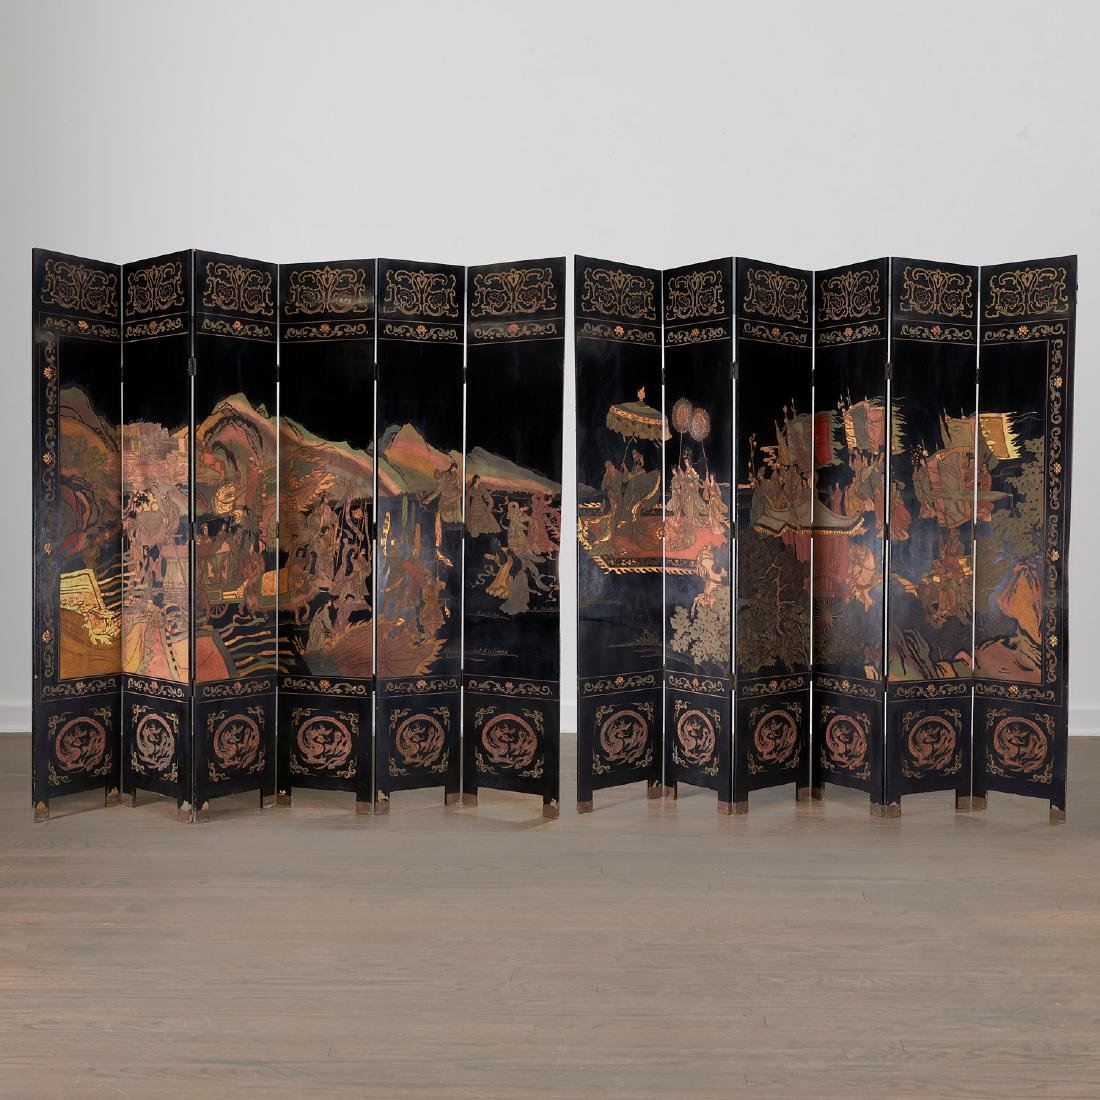 Jacques Grange sourced coromandel screens